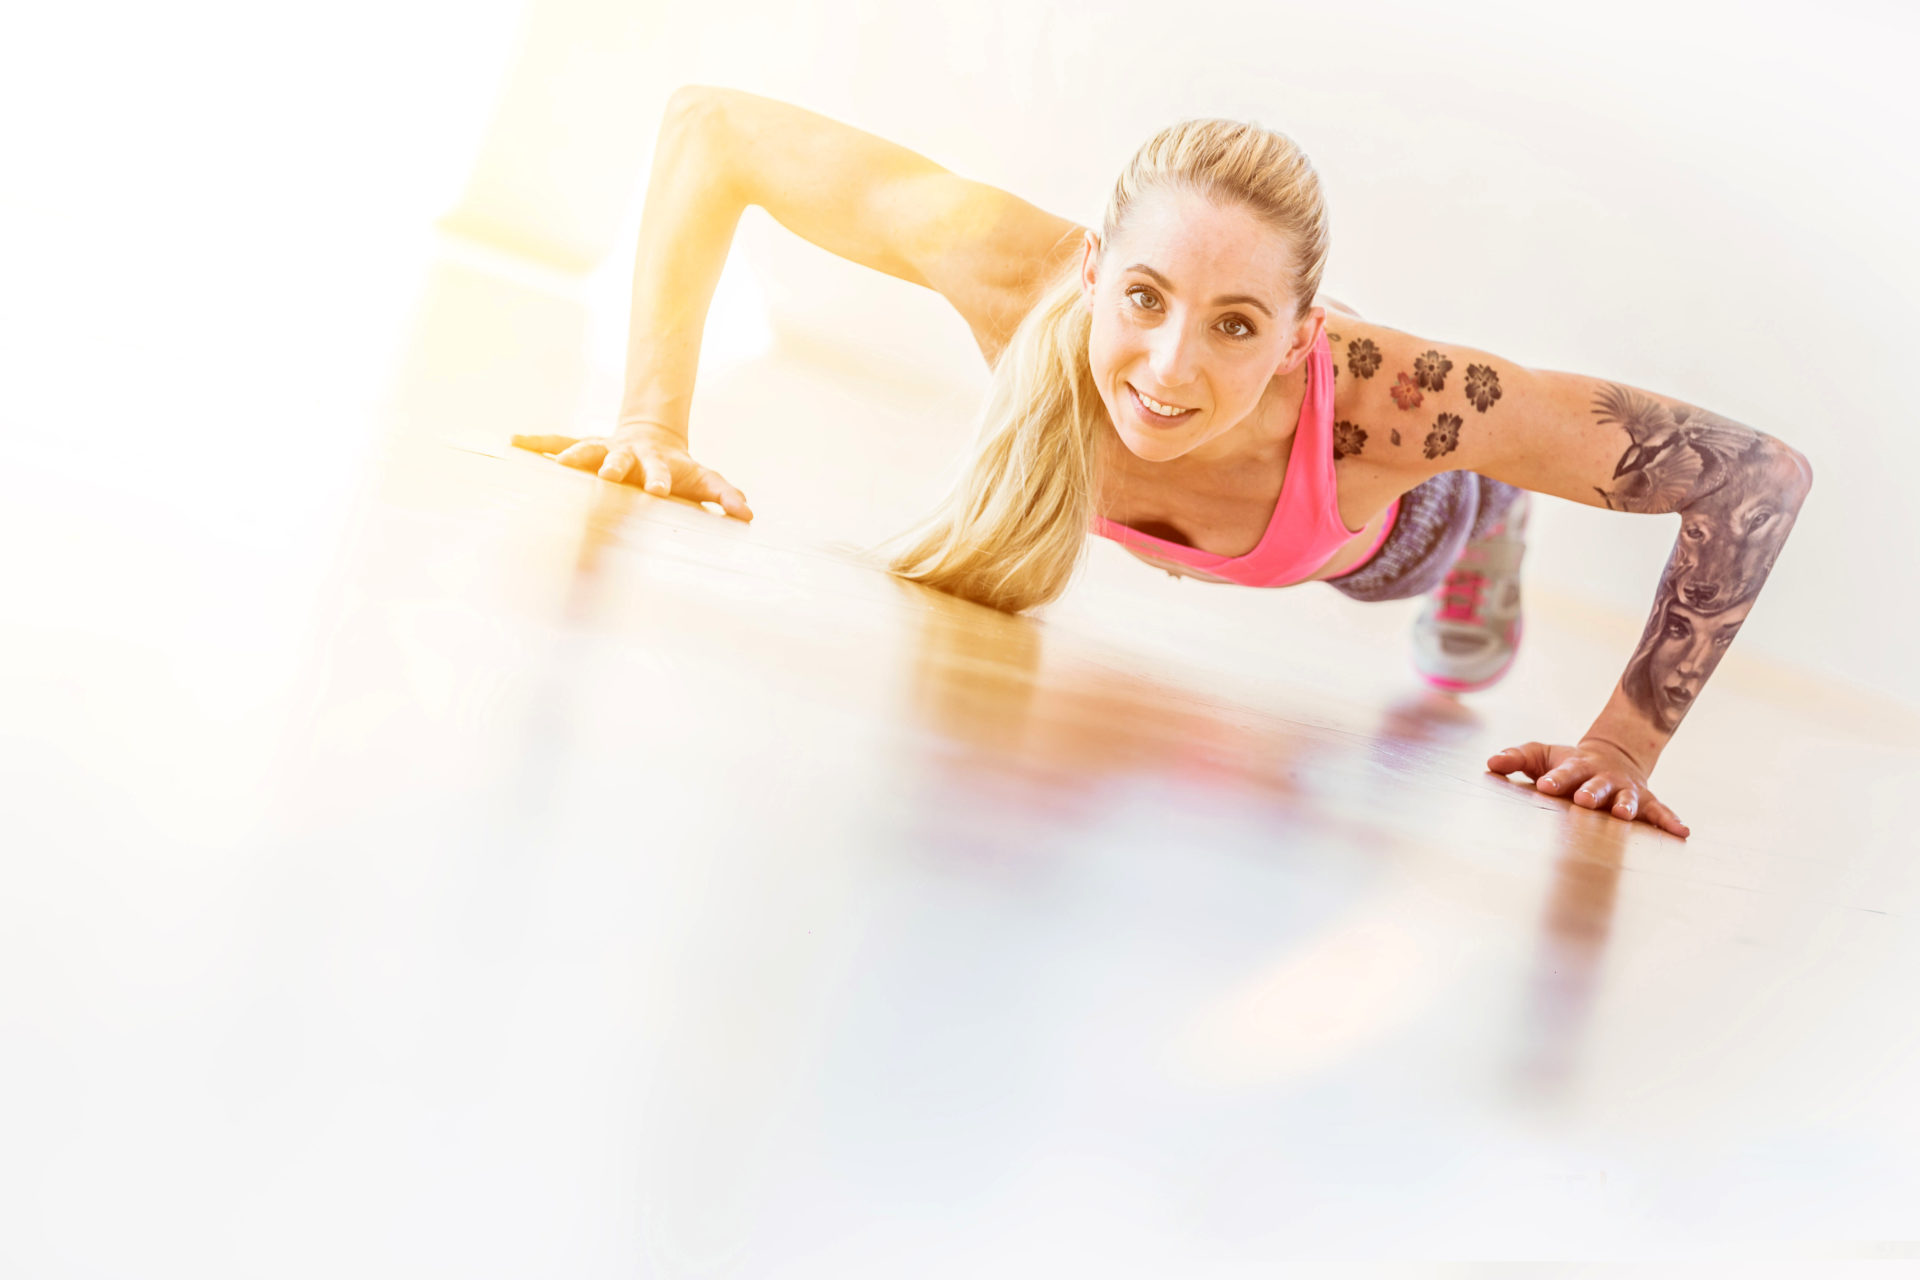 Fitness Portraits SportFoto: Thomas Niedermueller / www.niedermueller.de